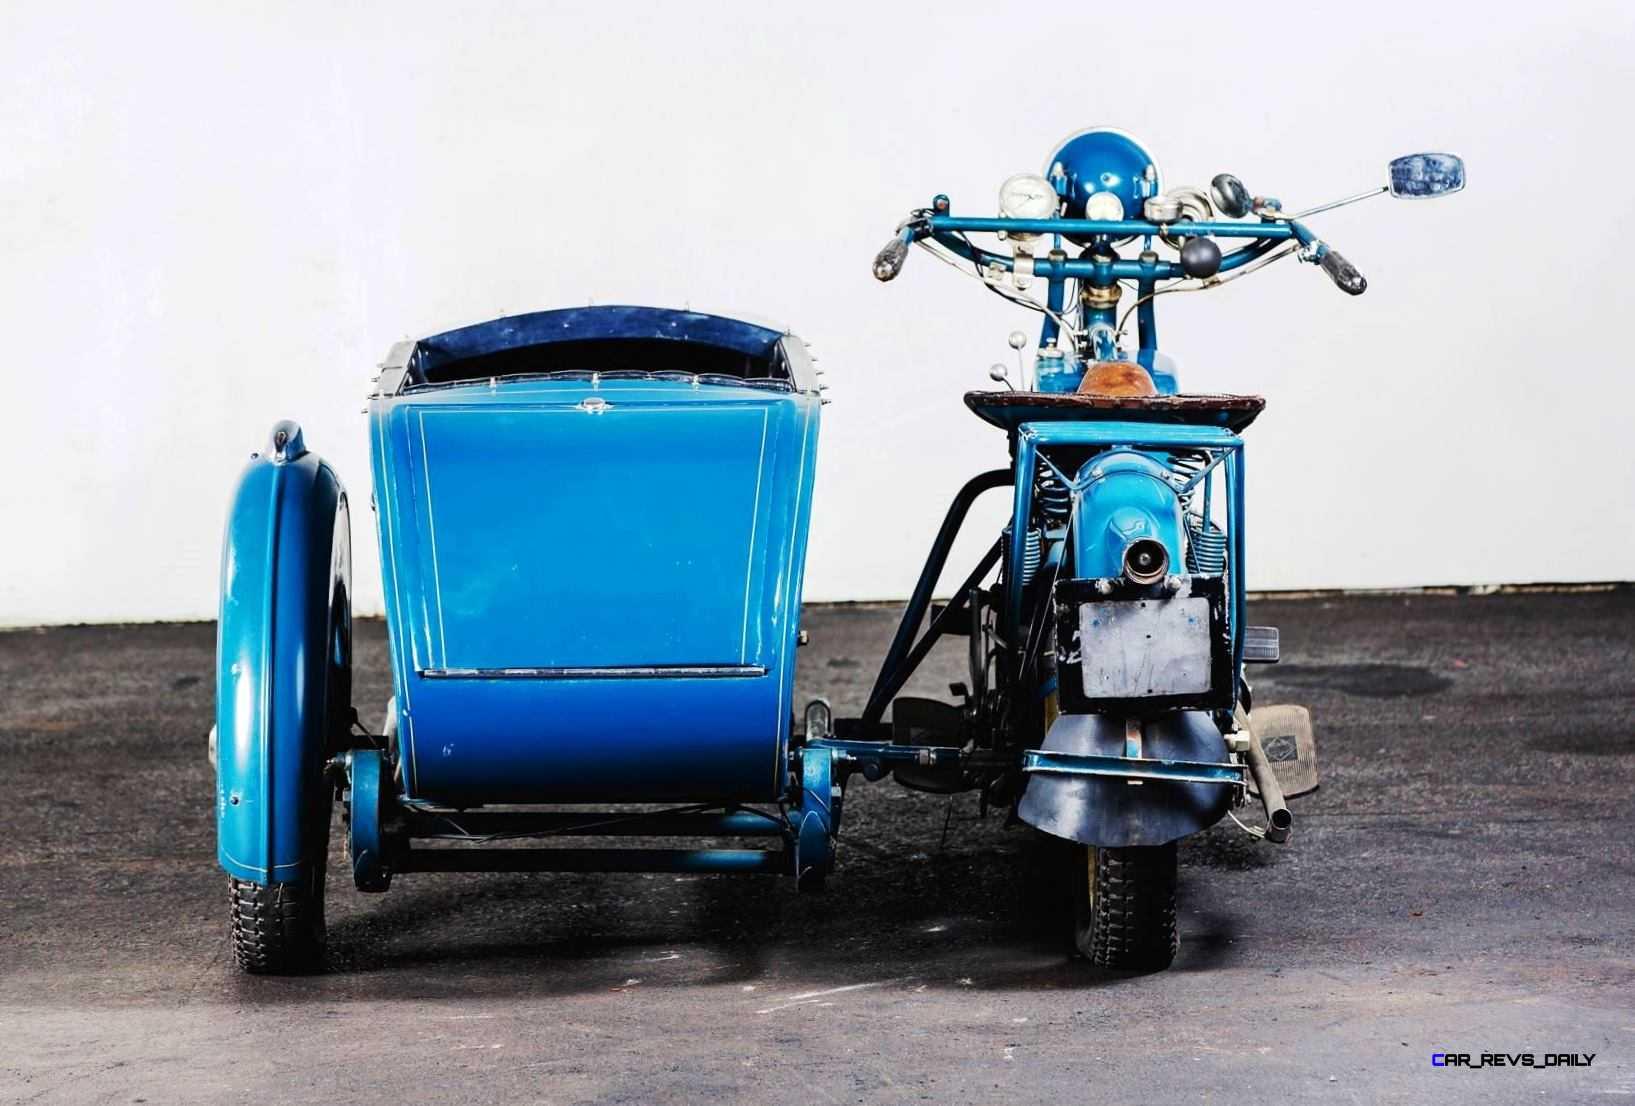 1925-Henderson-De-Luxe-with-Goulding-Sidecar-181.jpg